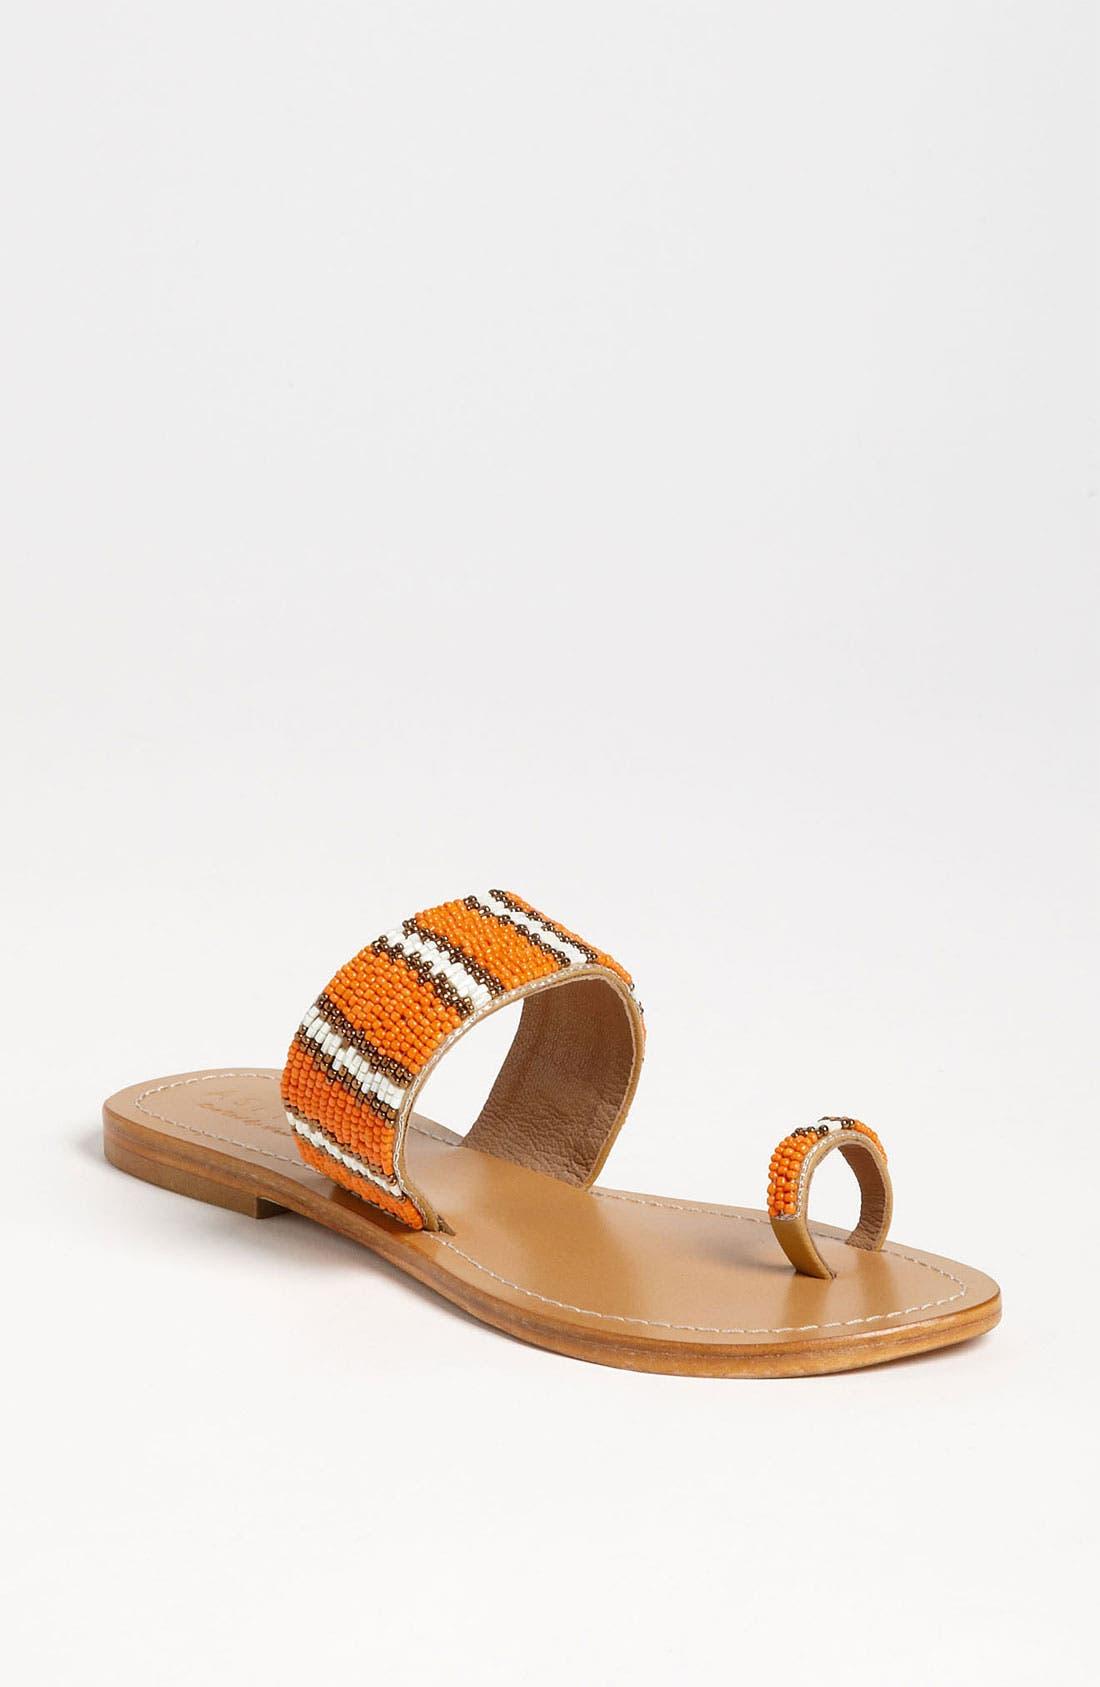 Alternate Image 1 Selected - Aspiga 'Omana' Sandal